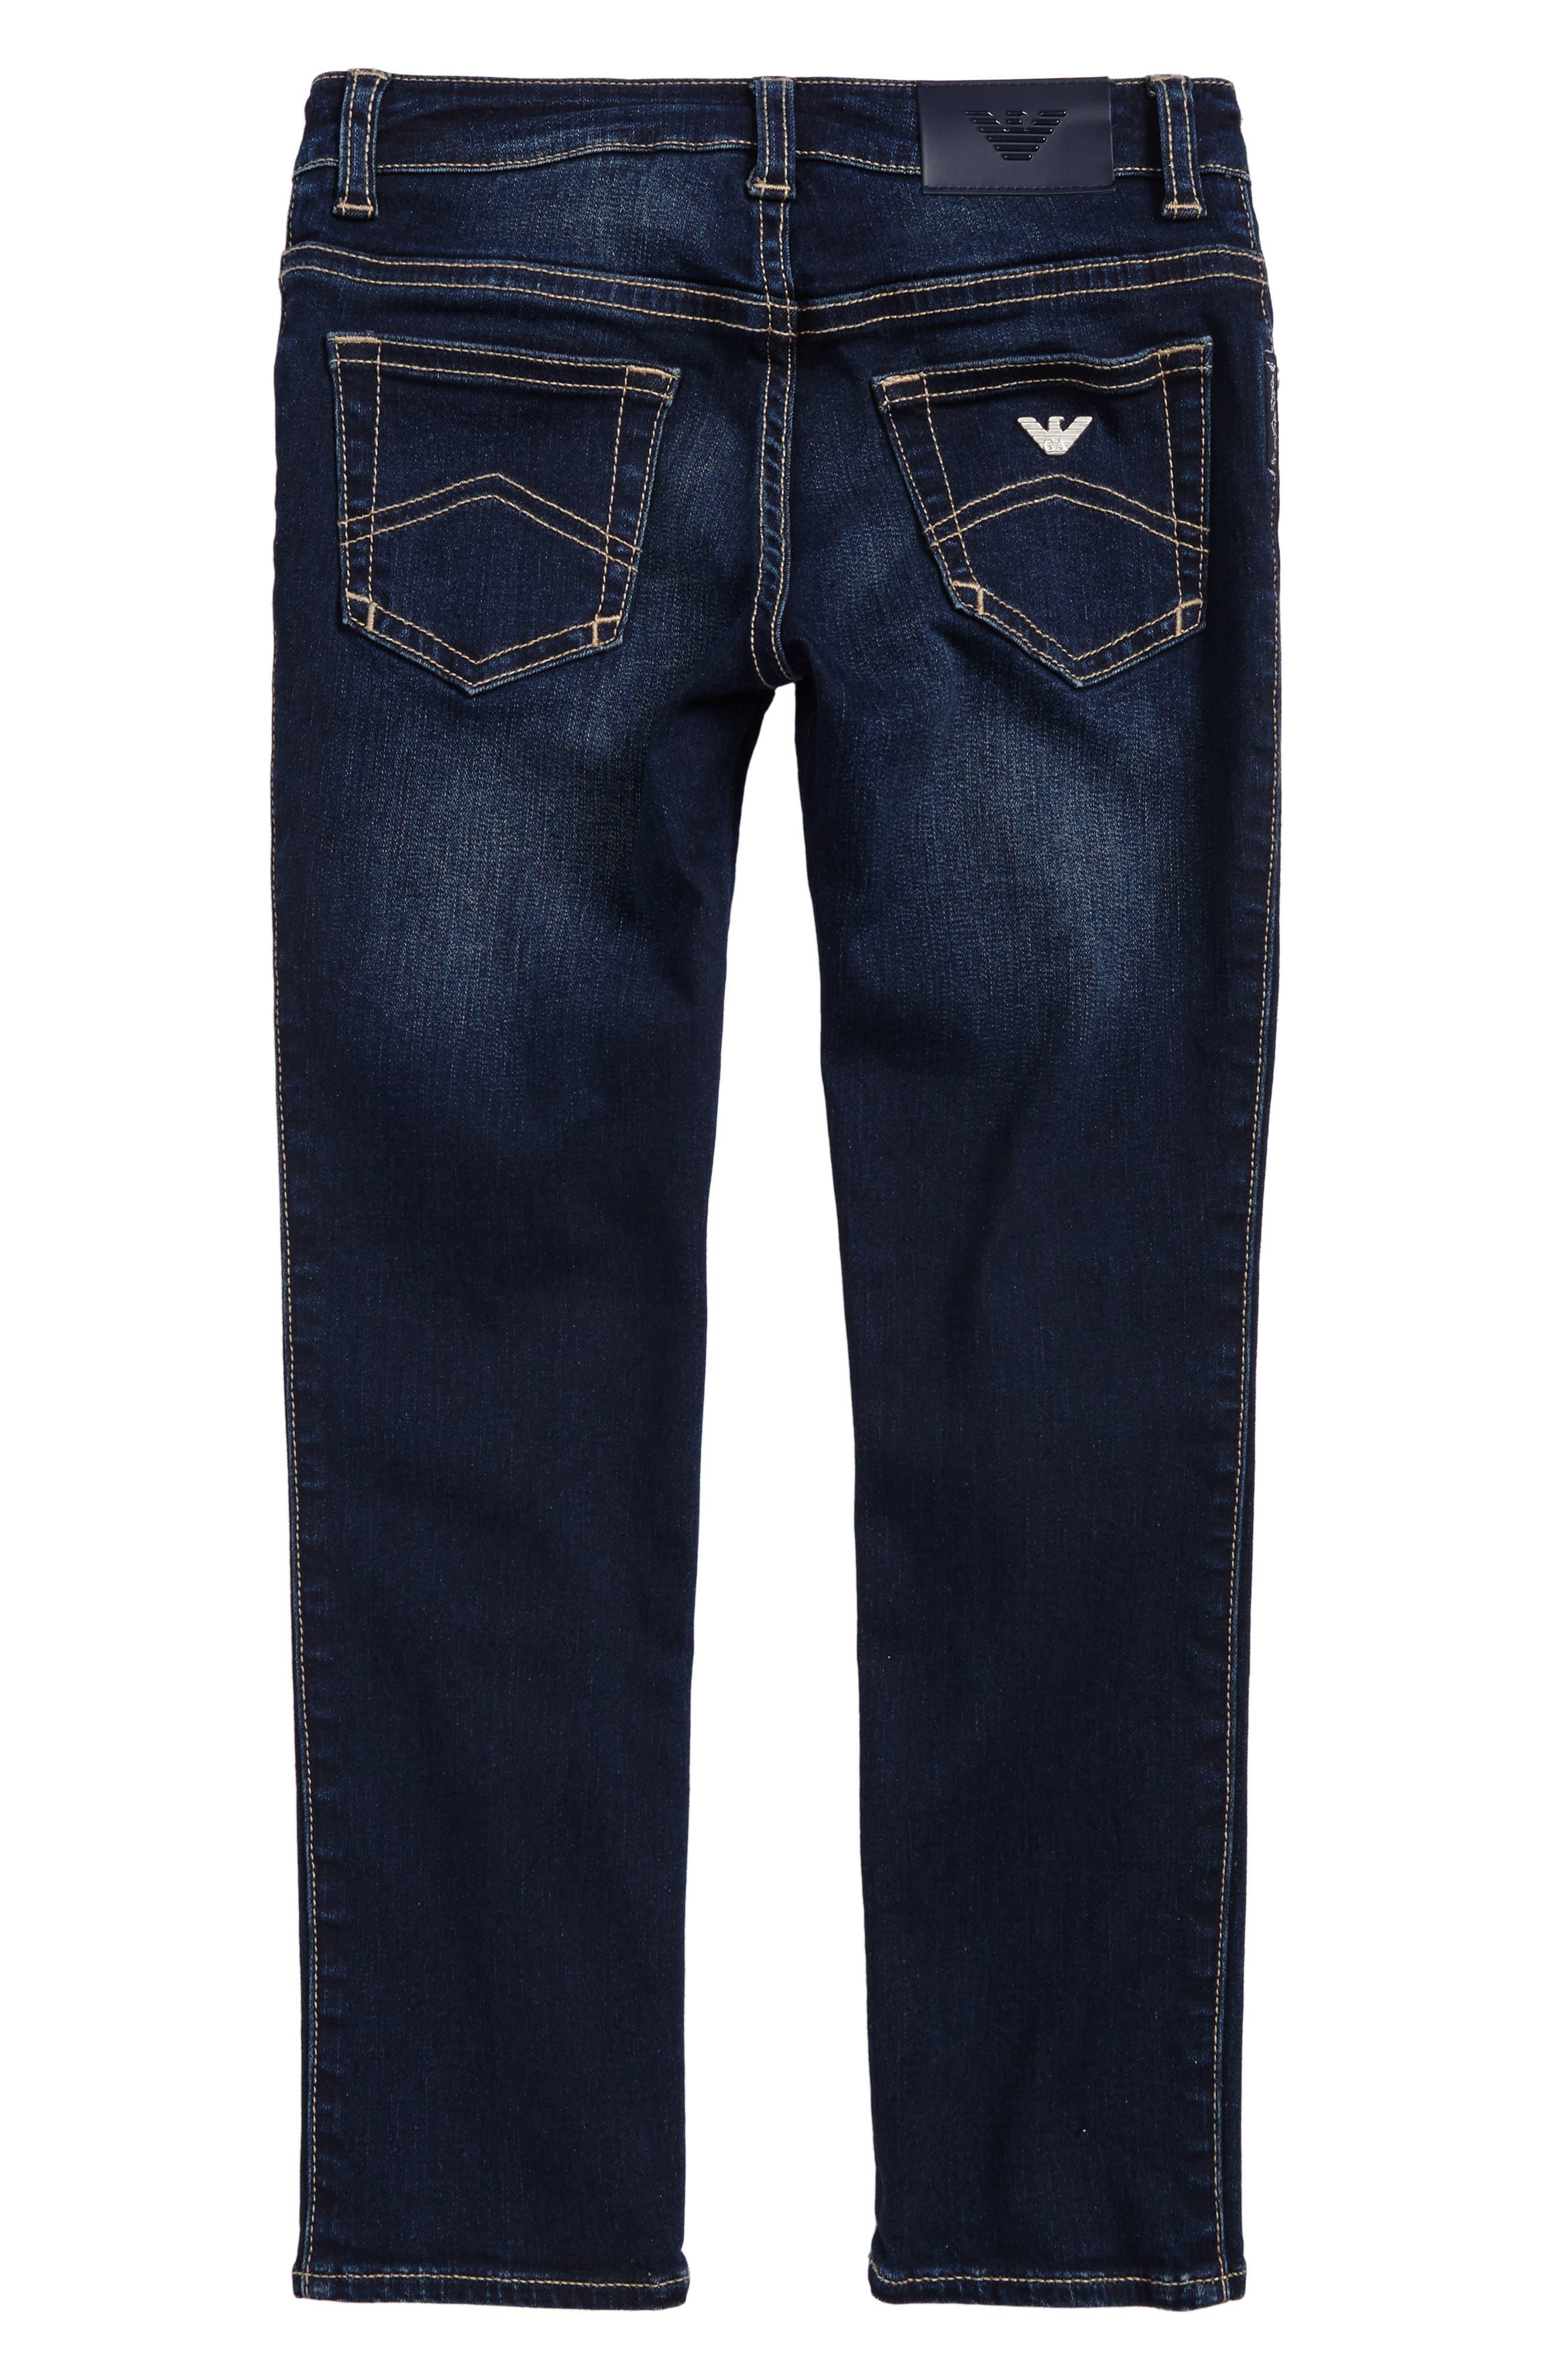 Straight Leg Jeans,                             Alternate thumbnail 2, color,                             424